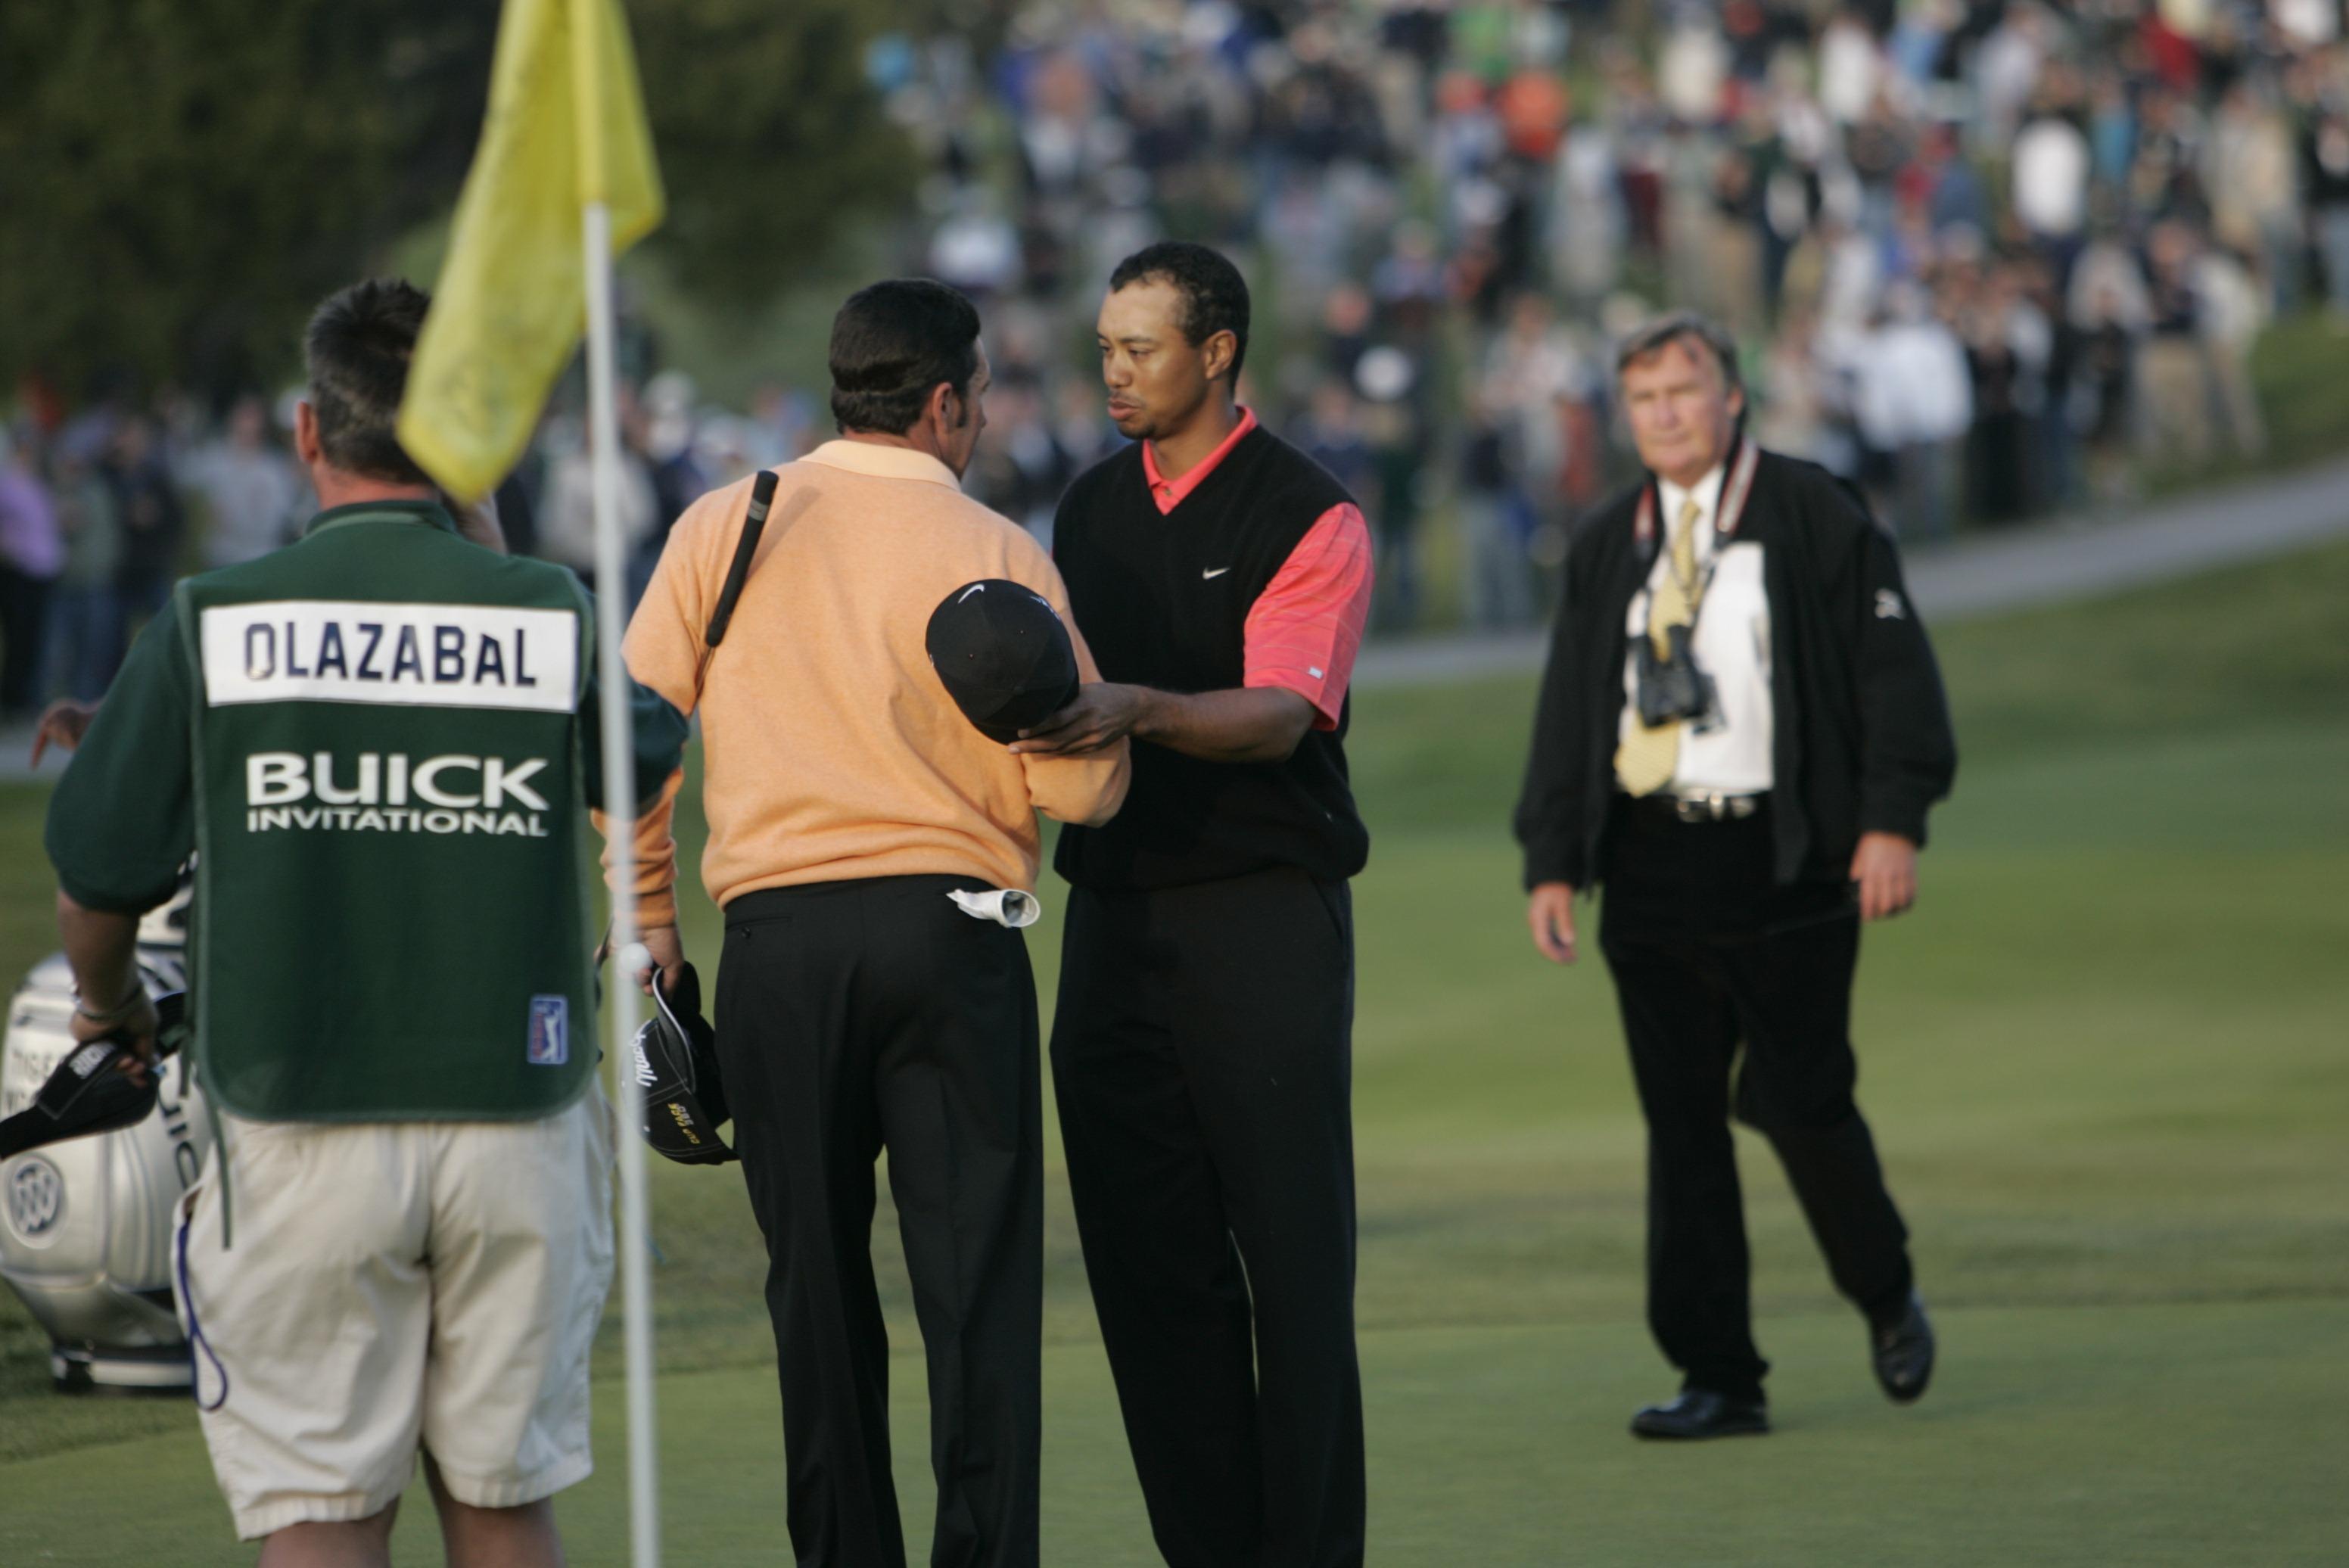 Tiger Woods 2006 Buick Invitational